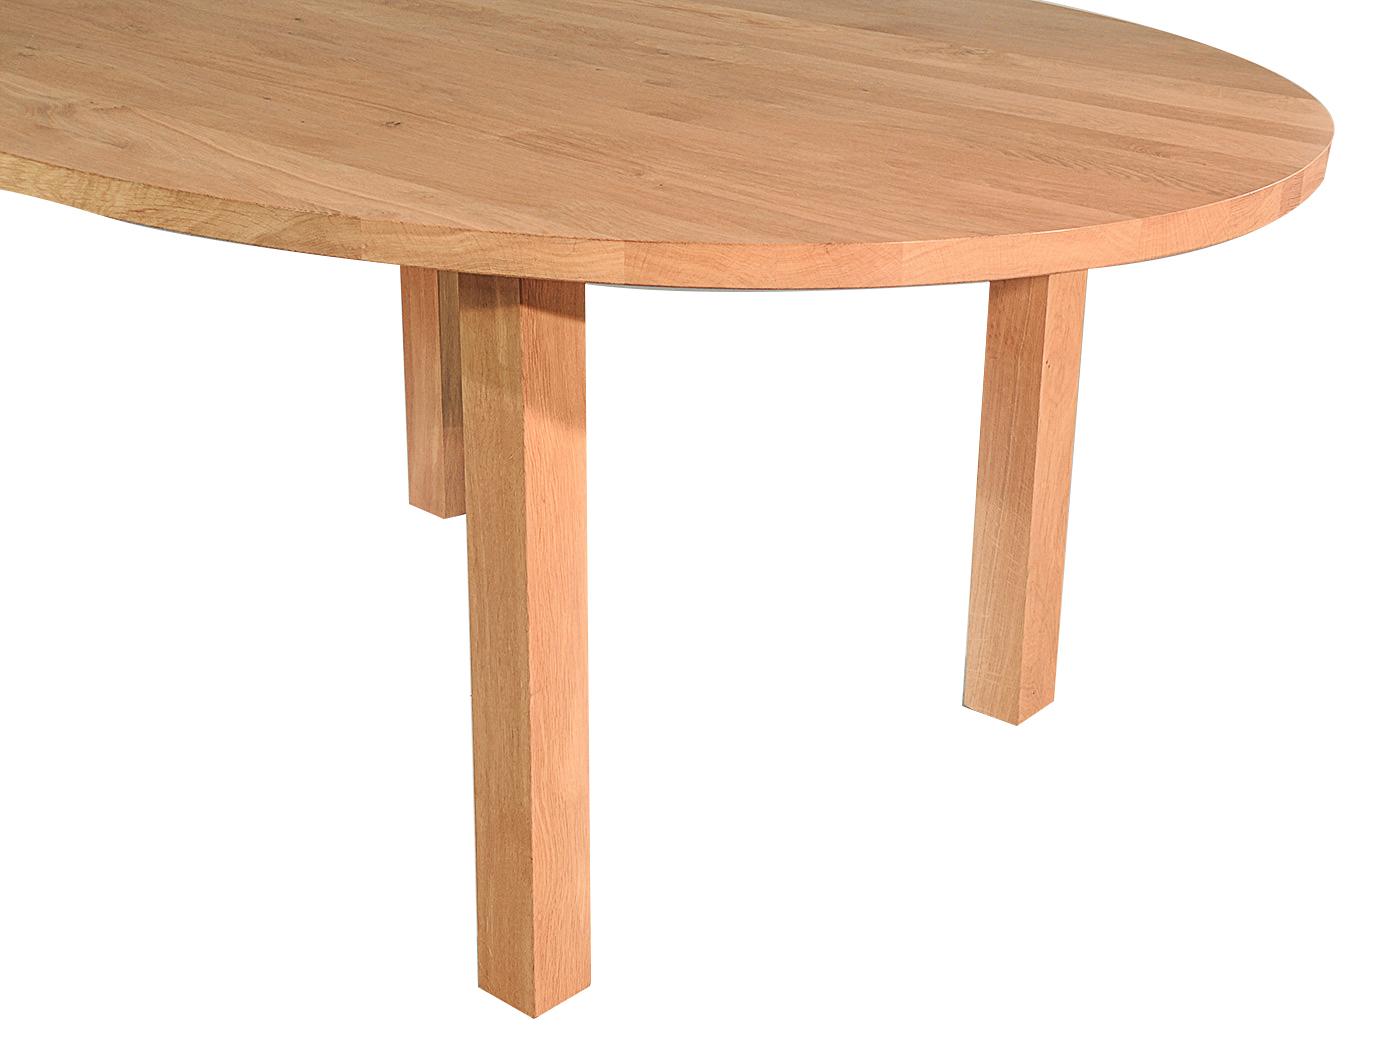 Caen - Ovale eettafel van eiken hout